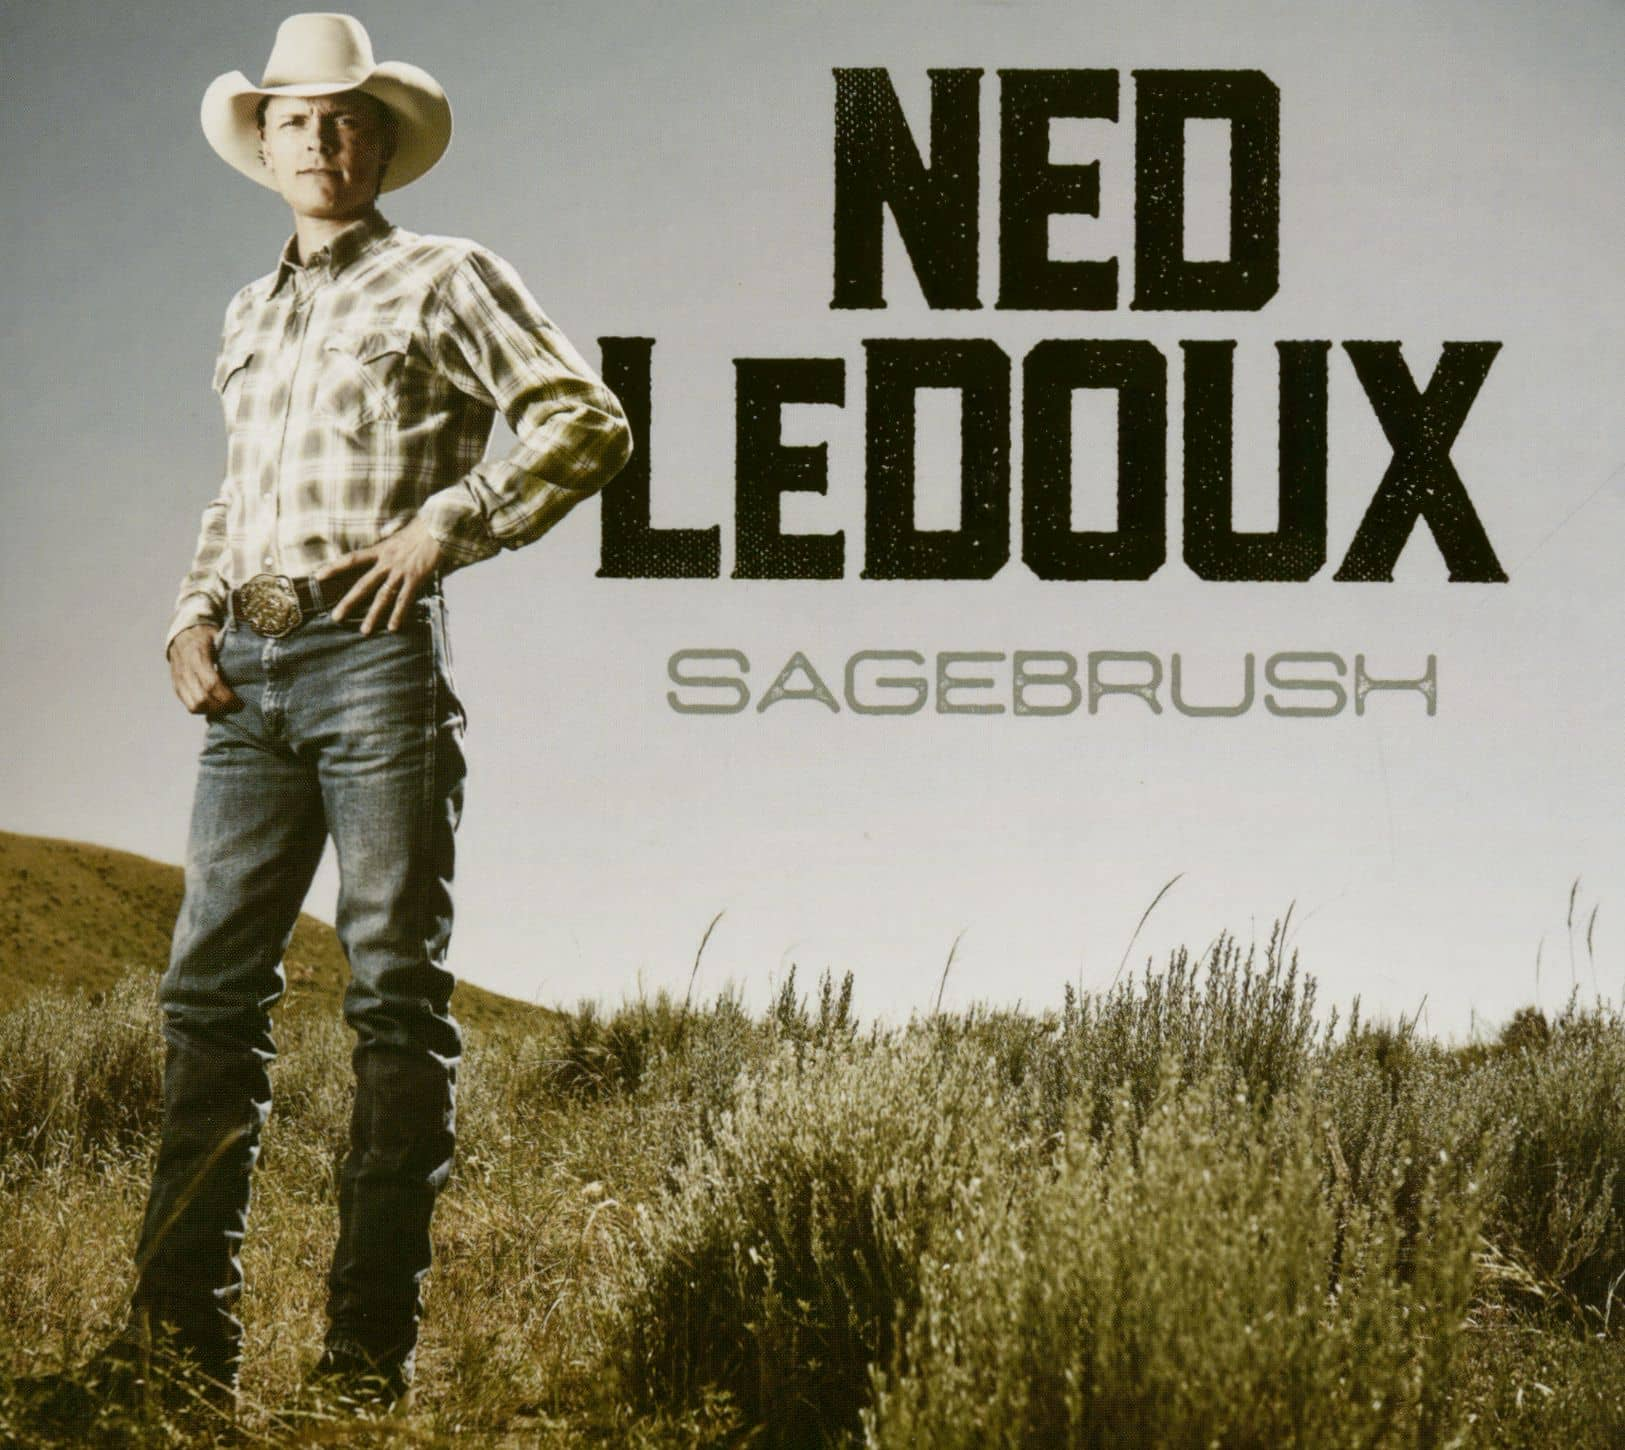 aa274391ab30f Ned LeDoux CD  Sagebrush (CD) - Bear Family Records